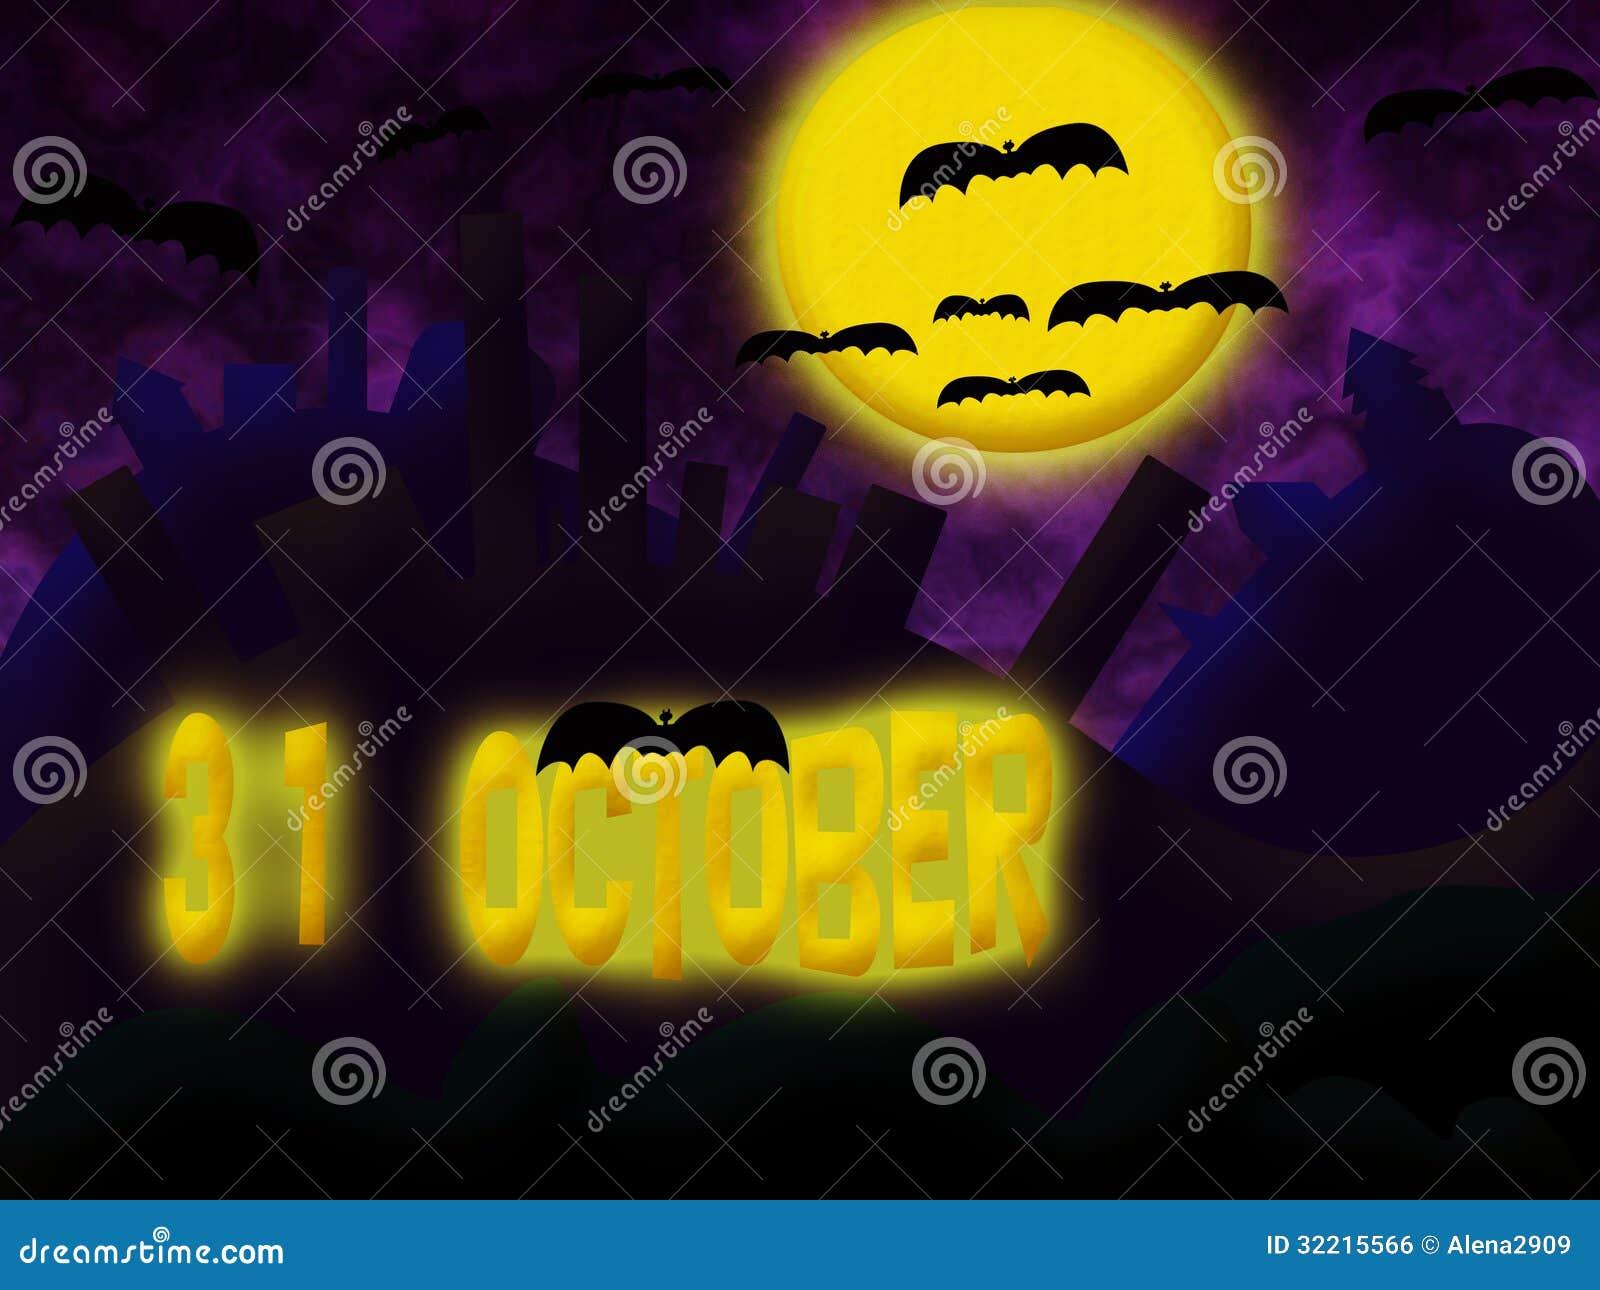 invitation to halloween. stock illustration. illustration of evil